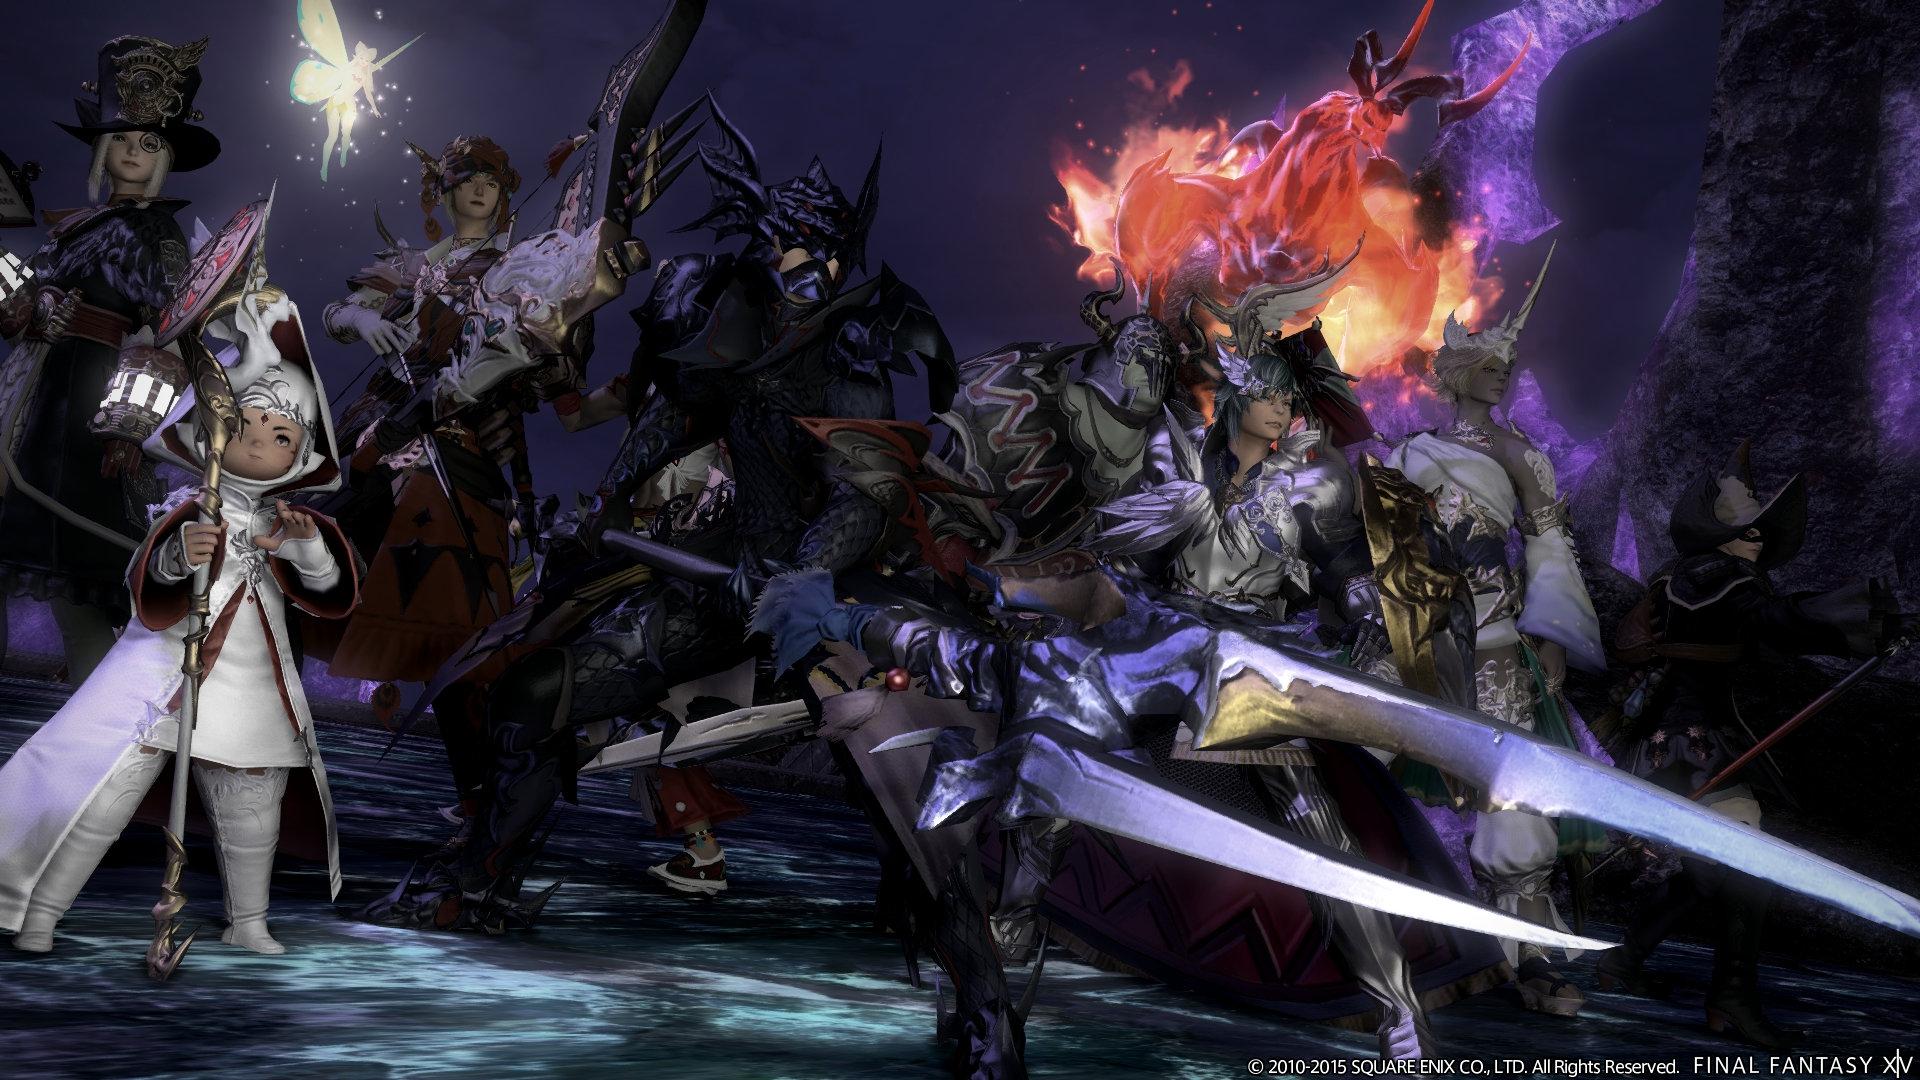 Final Fantasy XIV: A Realm Reborn Game | PS4 - PlayStation